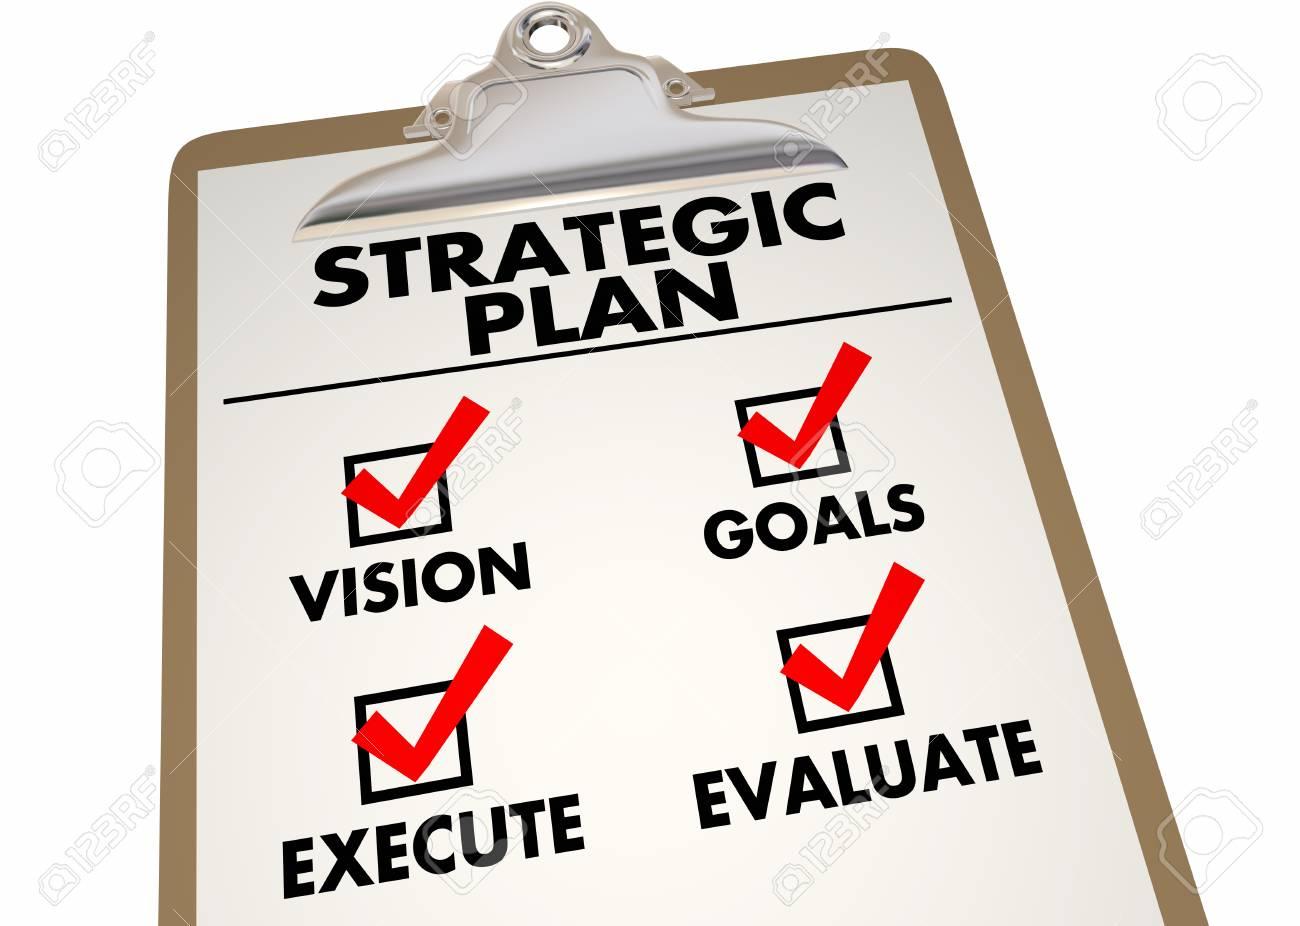 Strategic Plan Clipboard Checklist Action Items 3d Illustration - 87246274